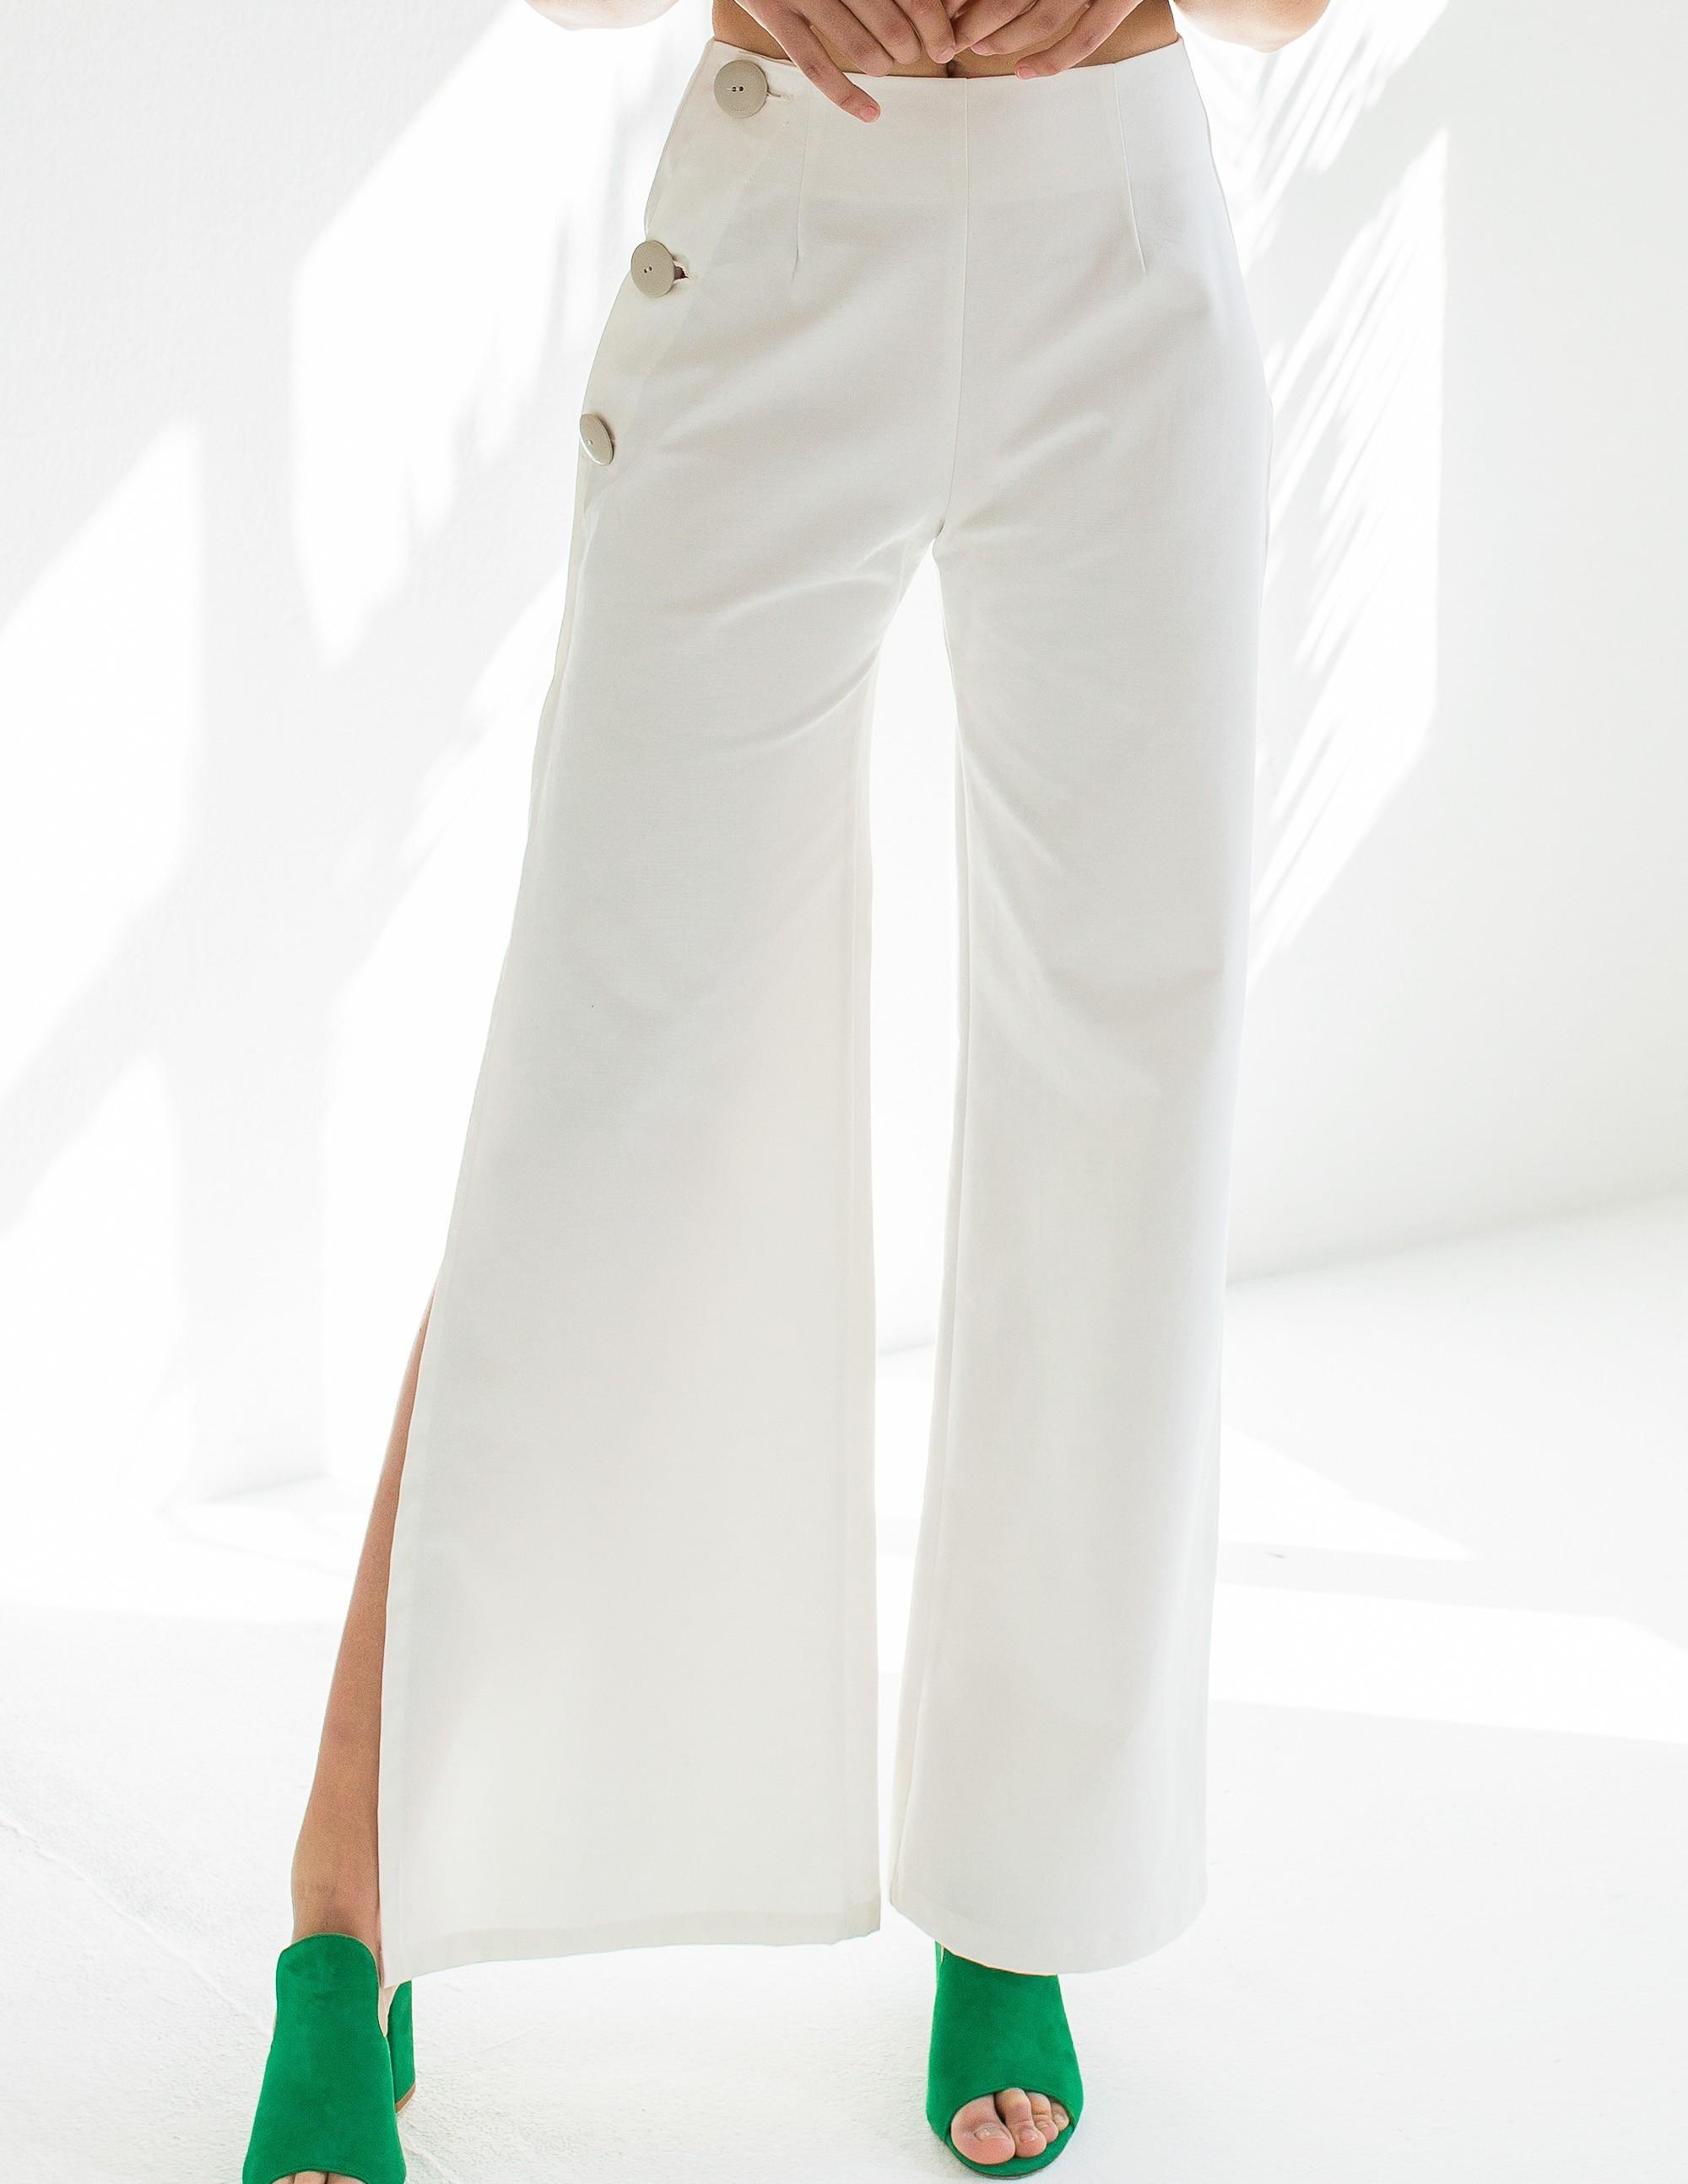 POSITANO pantalones - PURE